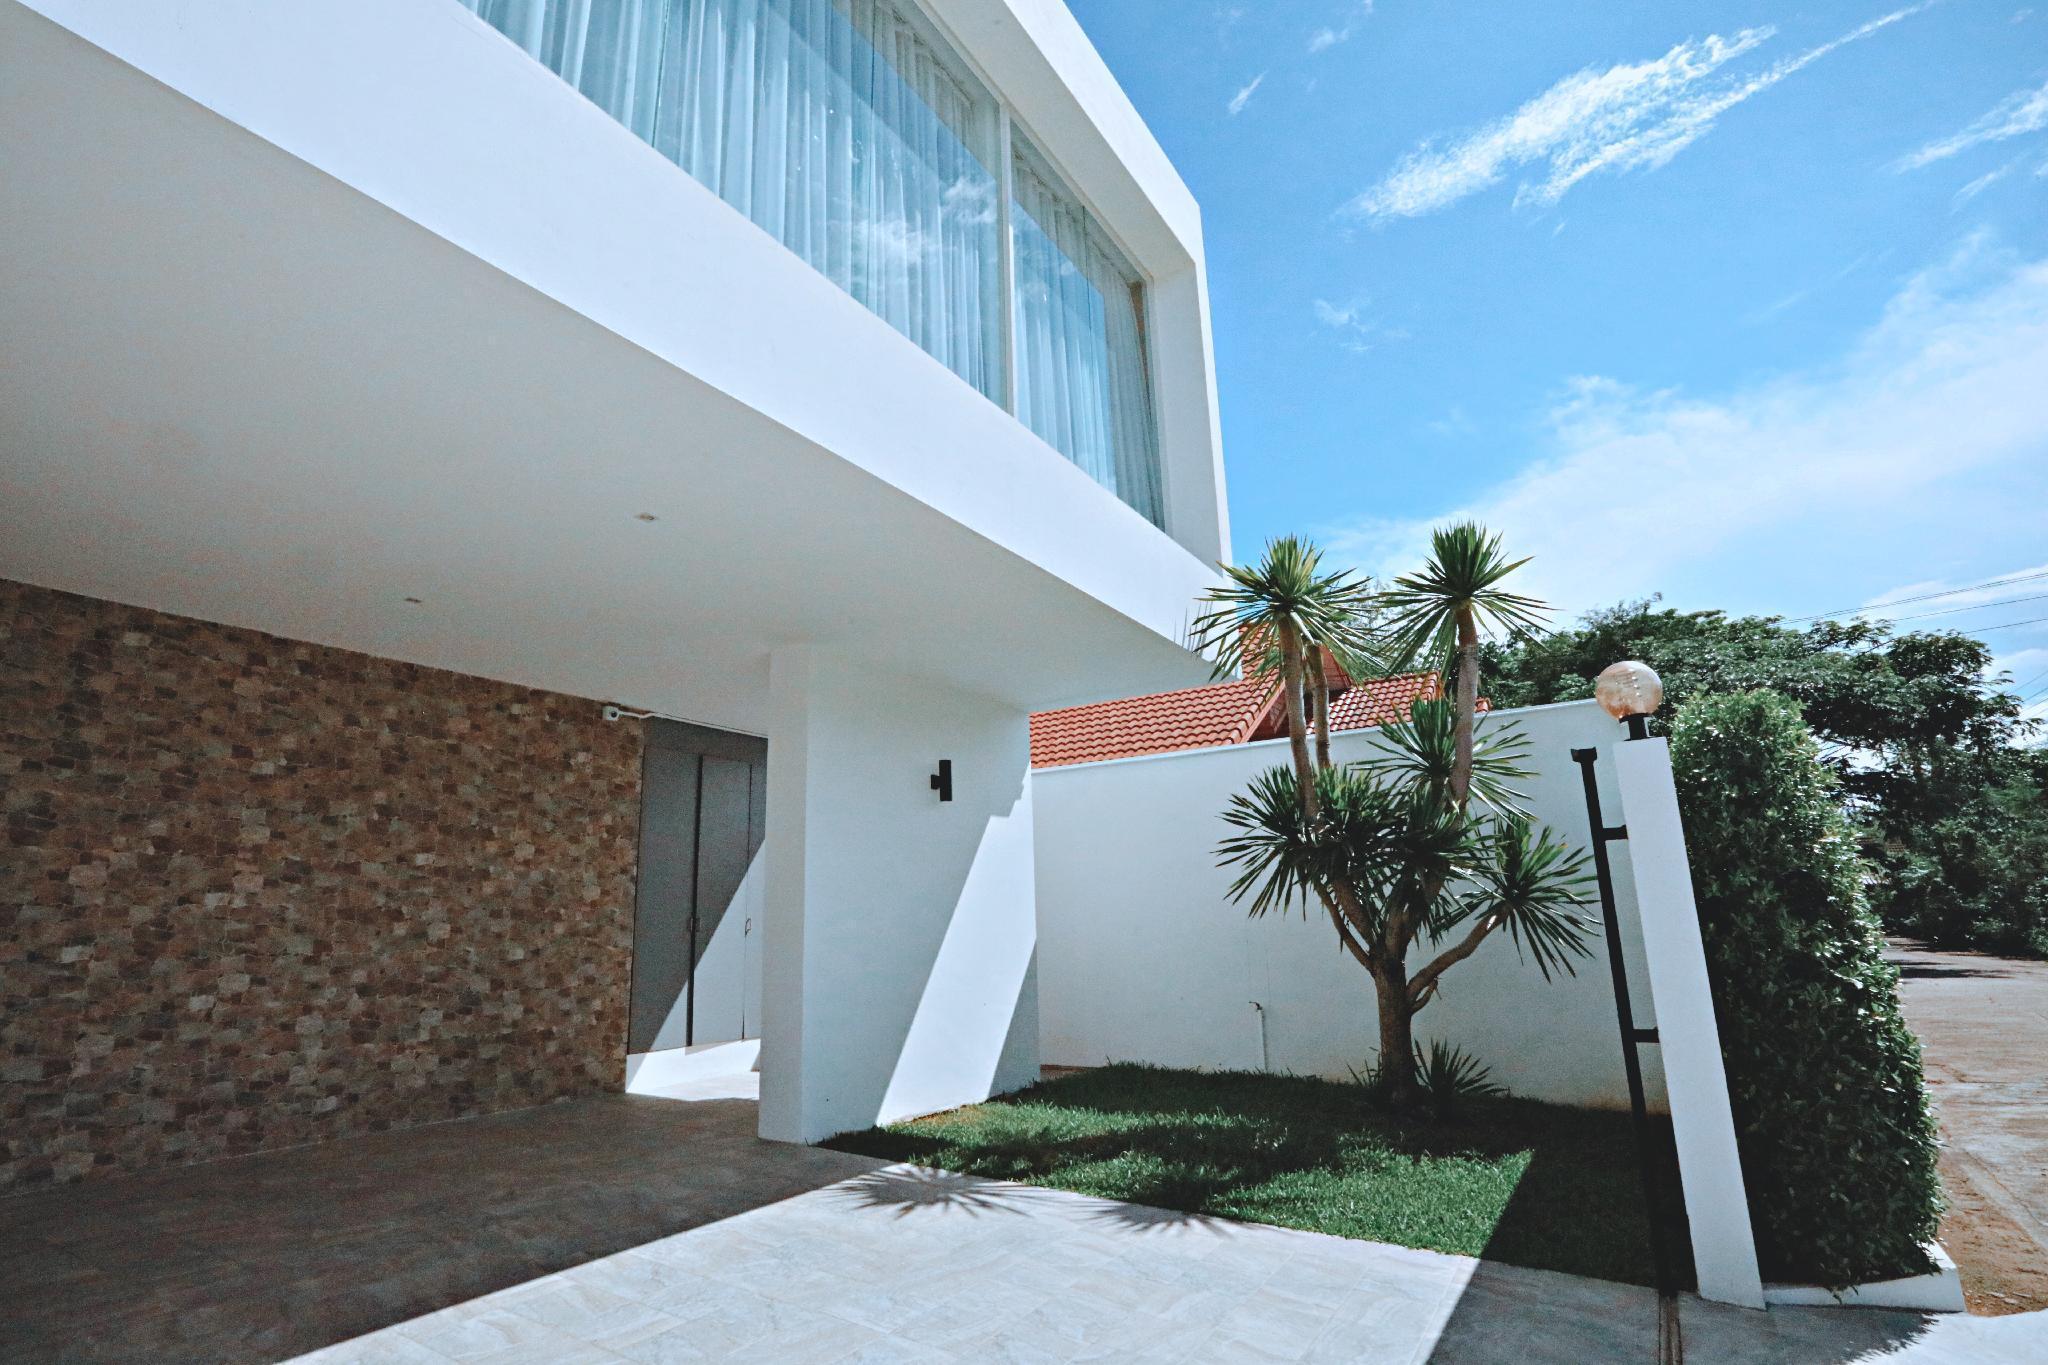 Chiang Mai  Youkr White Pool Villa วิลลา 4 ห้องนอน 4 ห้องน้ำส่วนตัว ขนาด 410 ตร.ม. – สันทราย